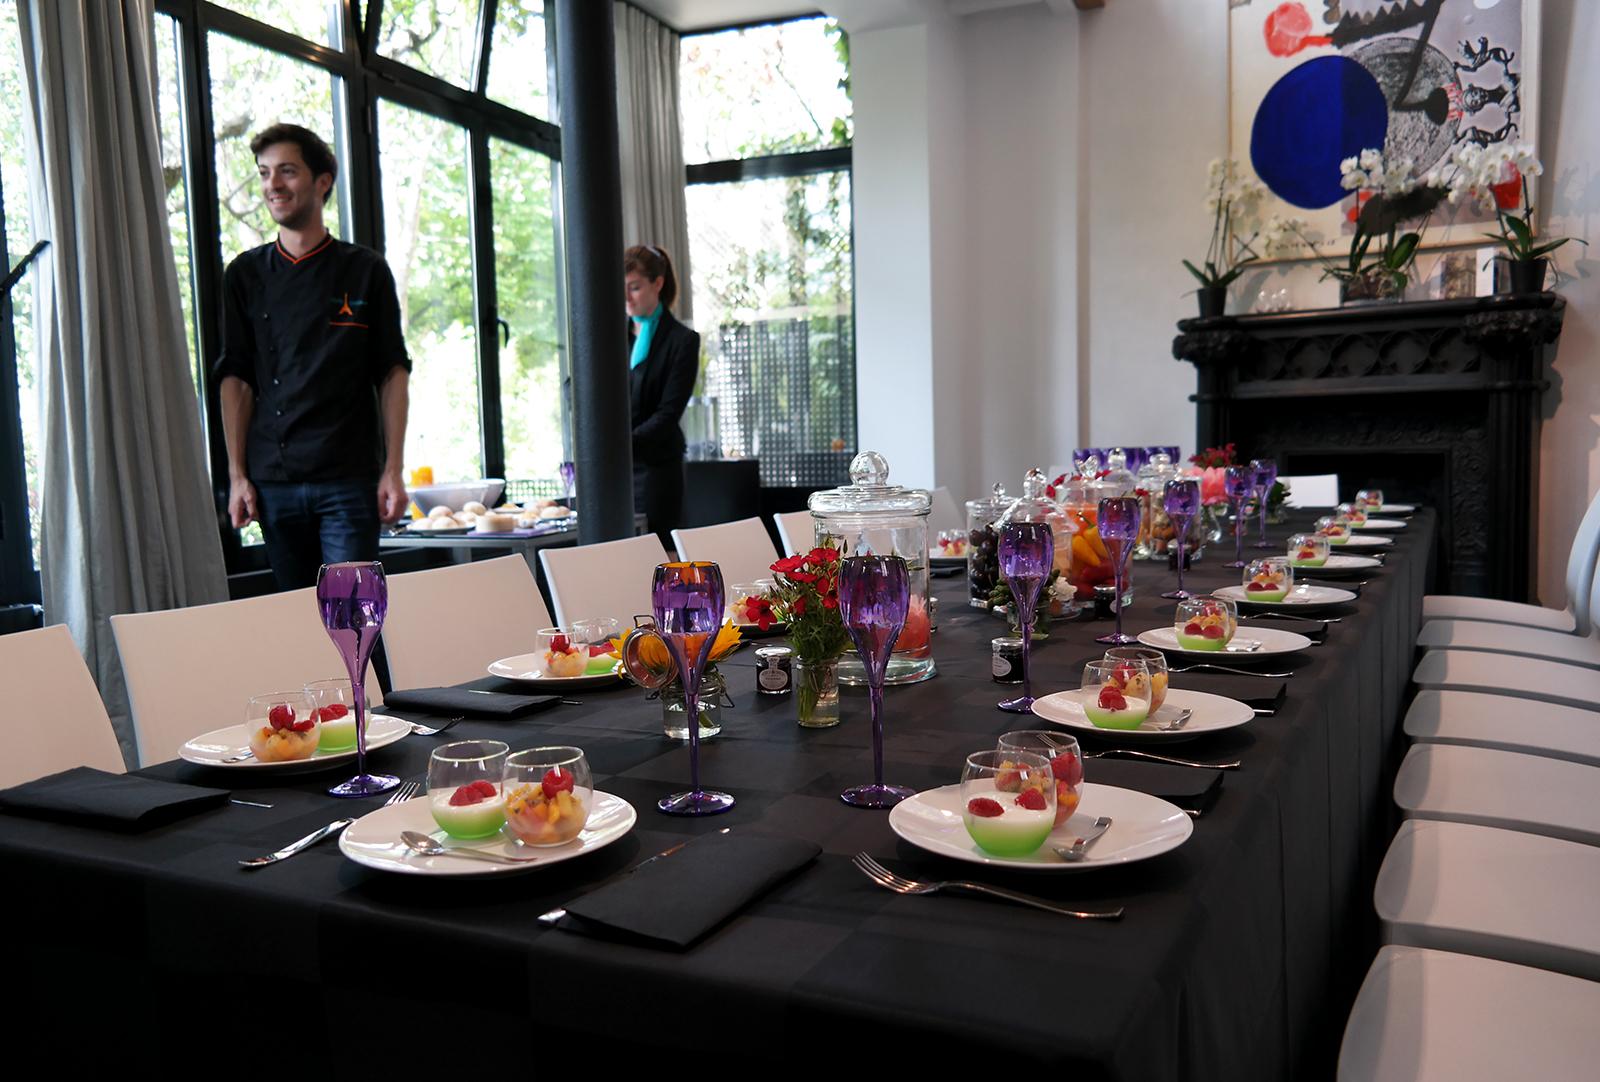 Jardin bistronomique 6 mandel jean christophe st erke for Diner dans un jardin paris